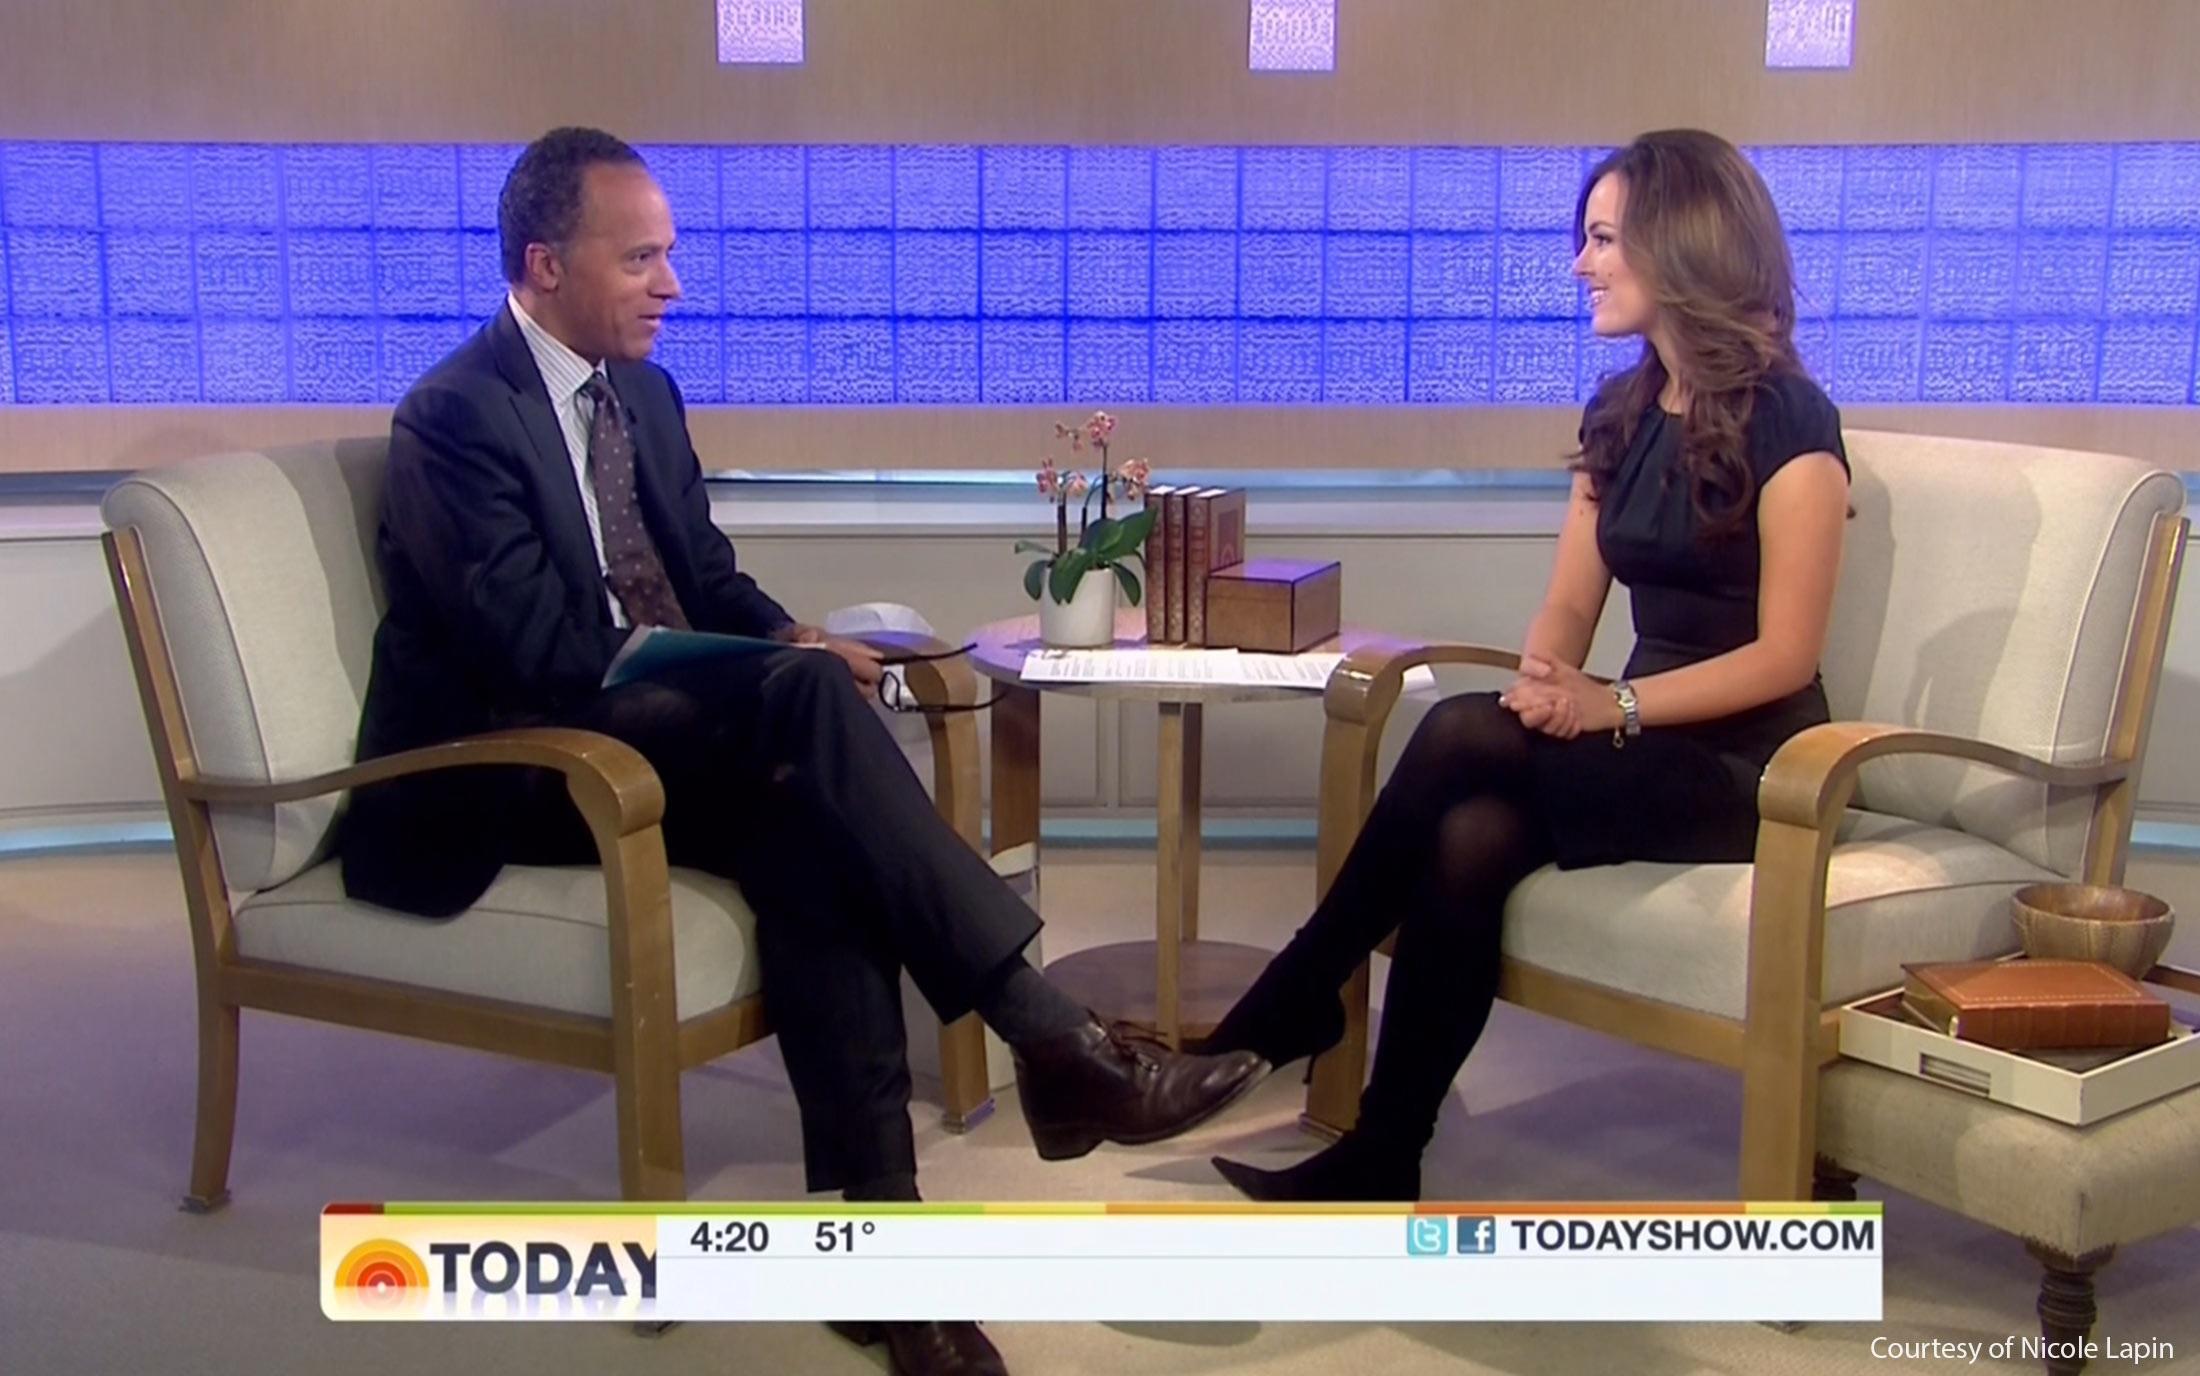 Nicole Lapin on NBC